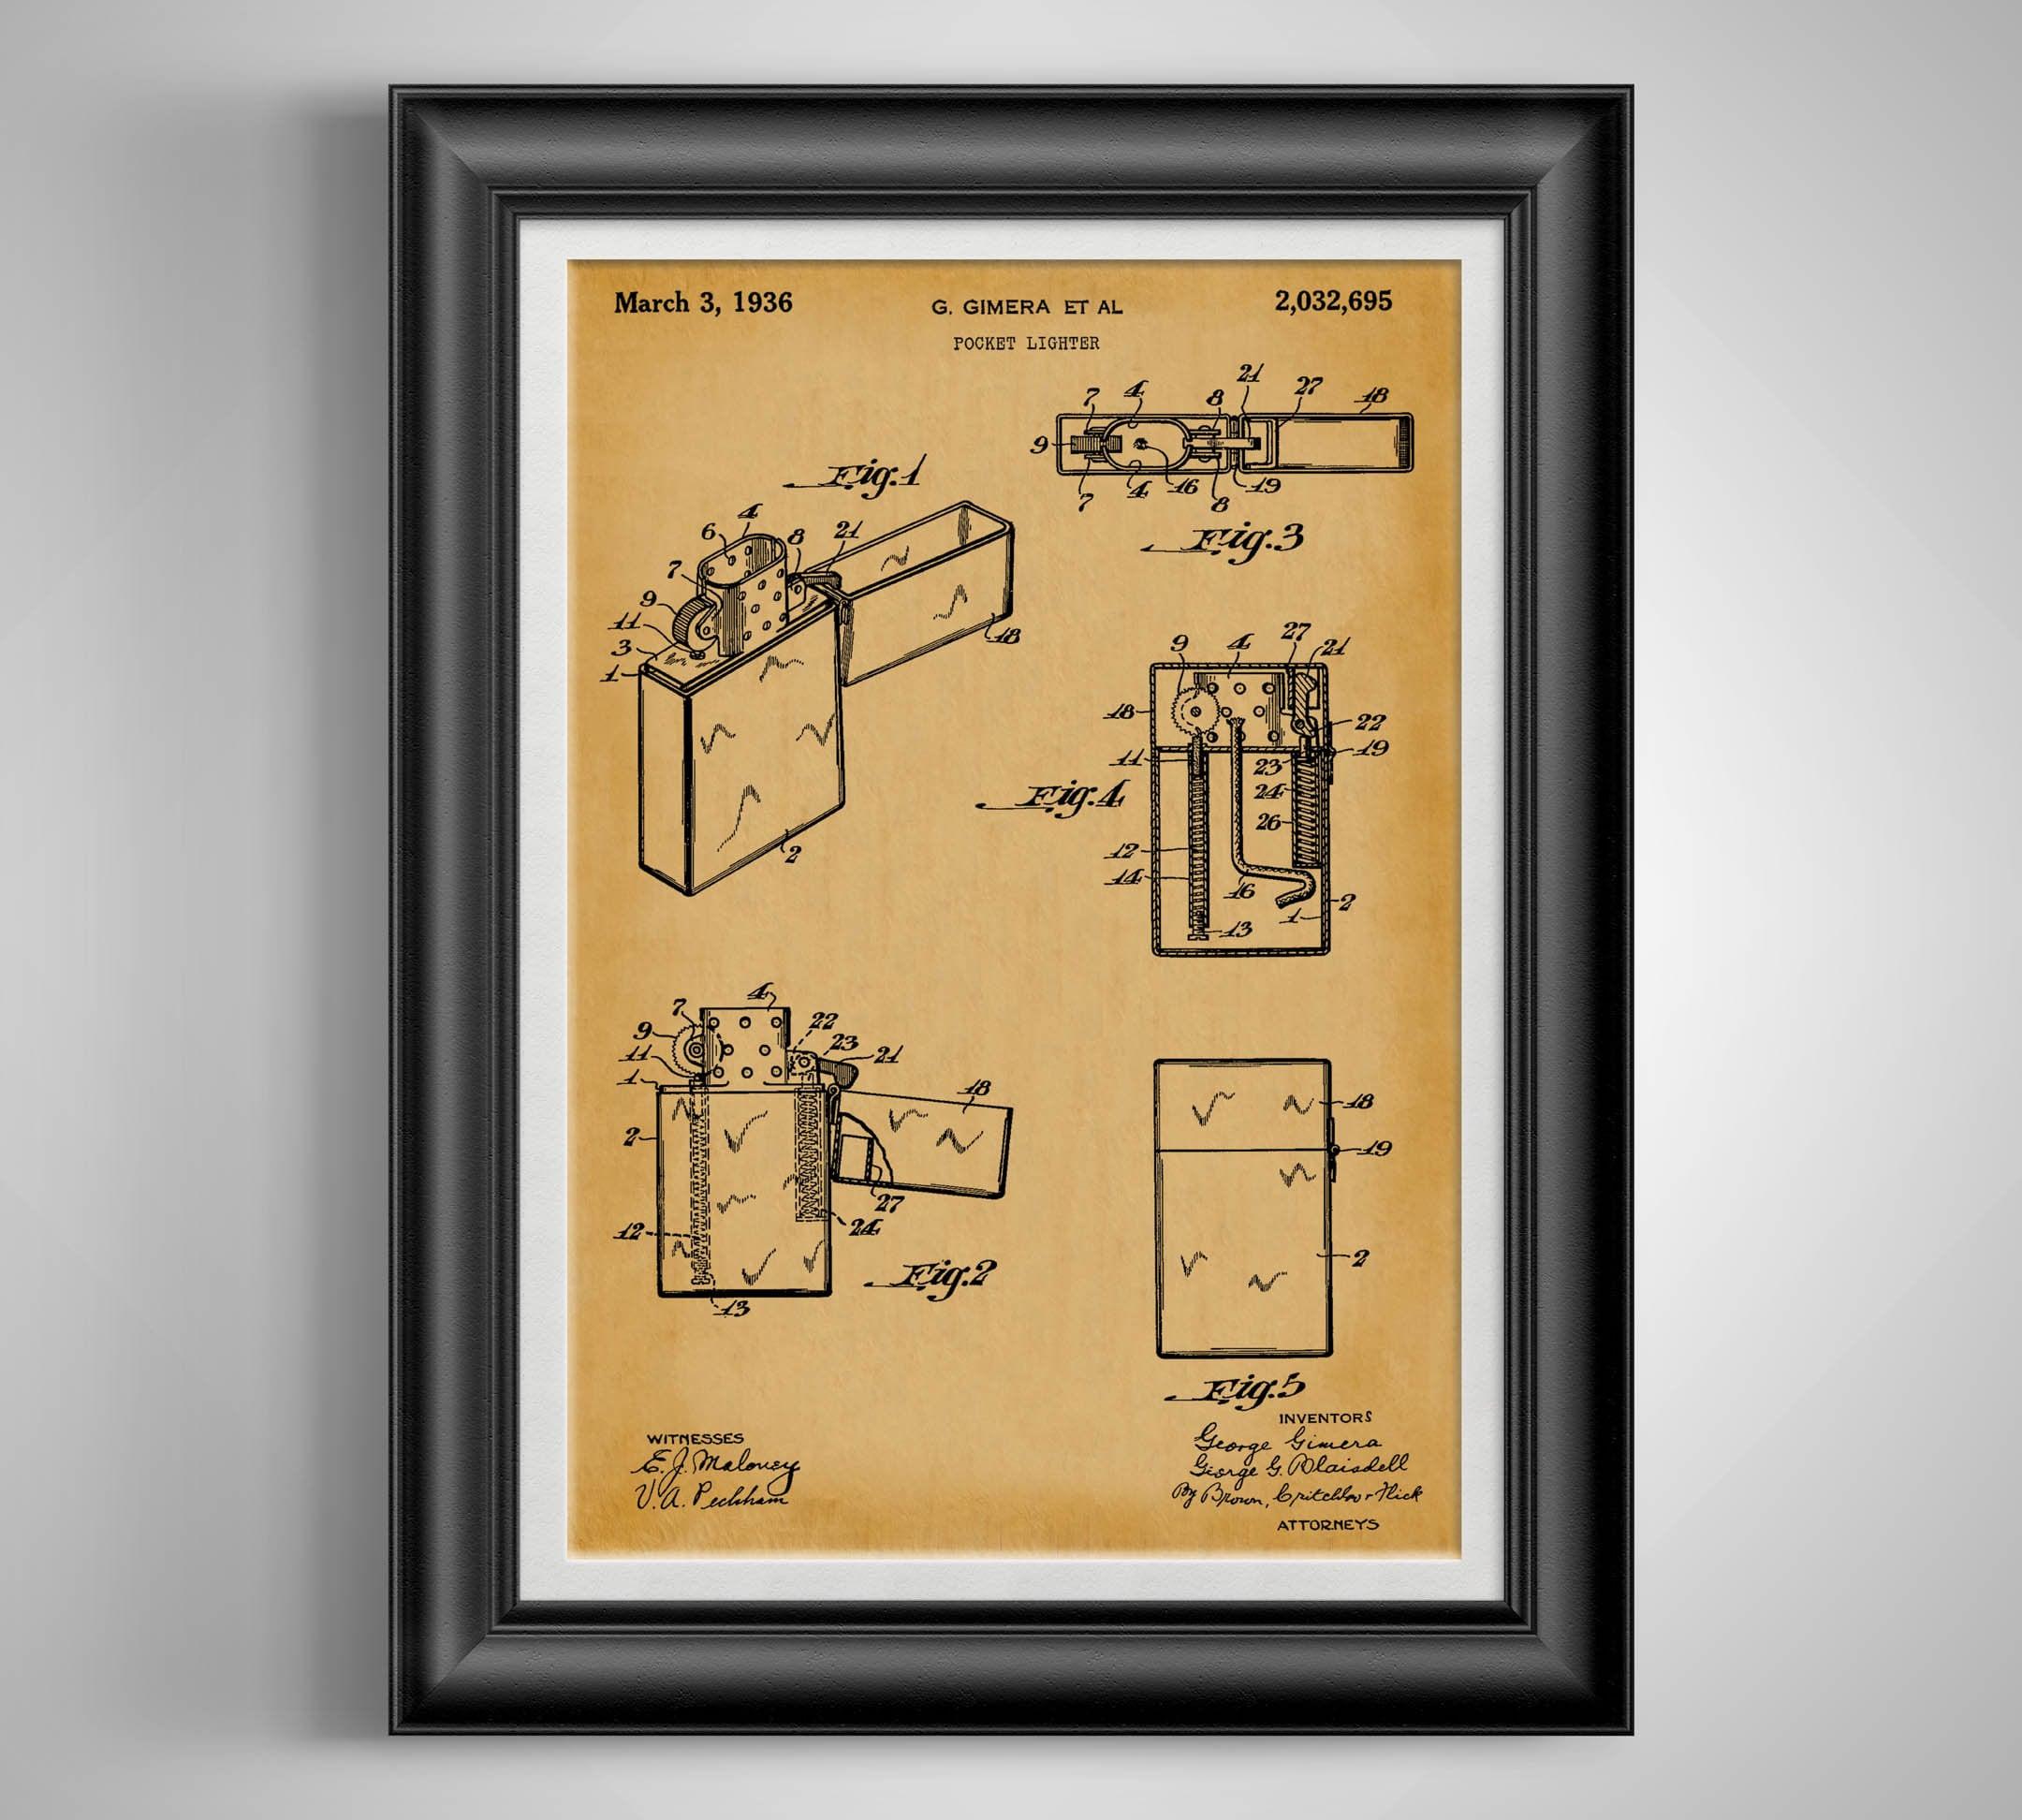 Zippo Lighter Patent Print Zippo Vintage Lighter Poster | Etsy